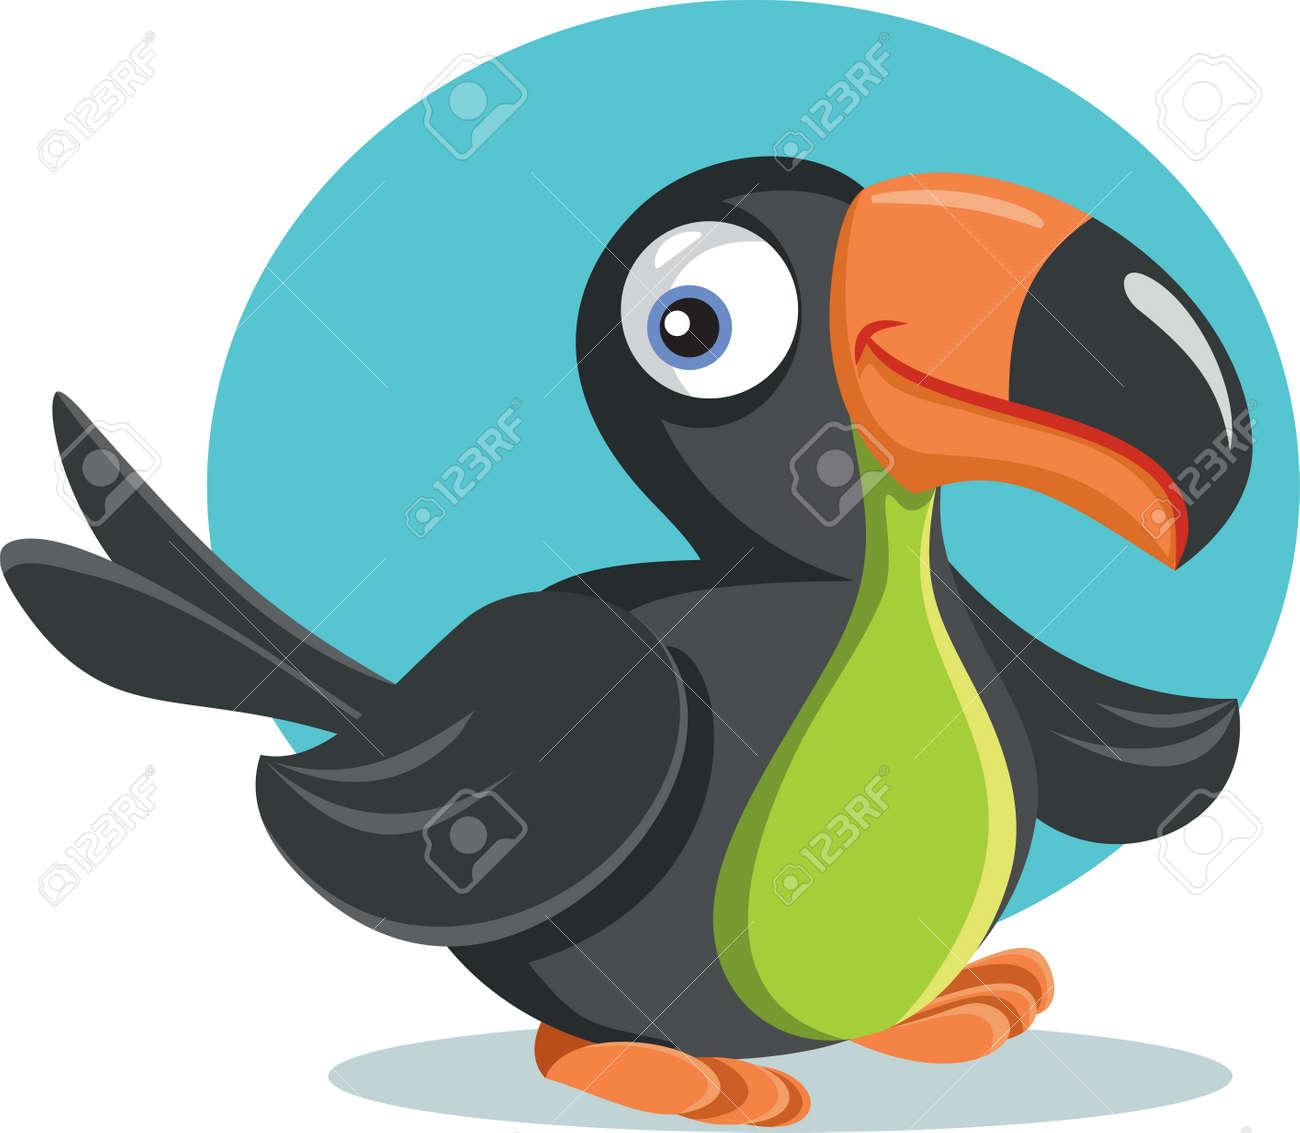 Funny Cartoon Toucan Bird Vector Illustration - 171317145